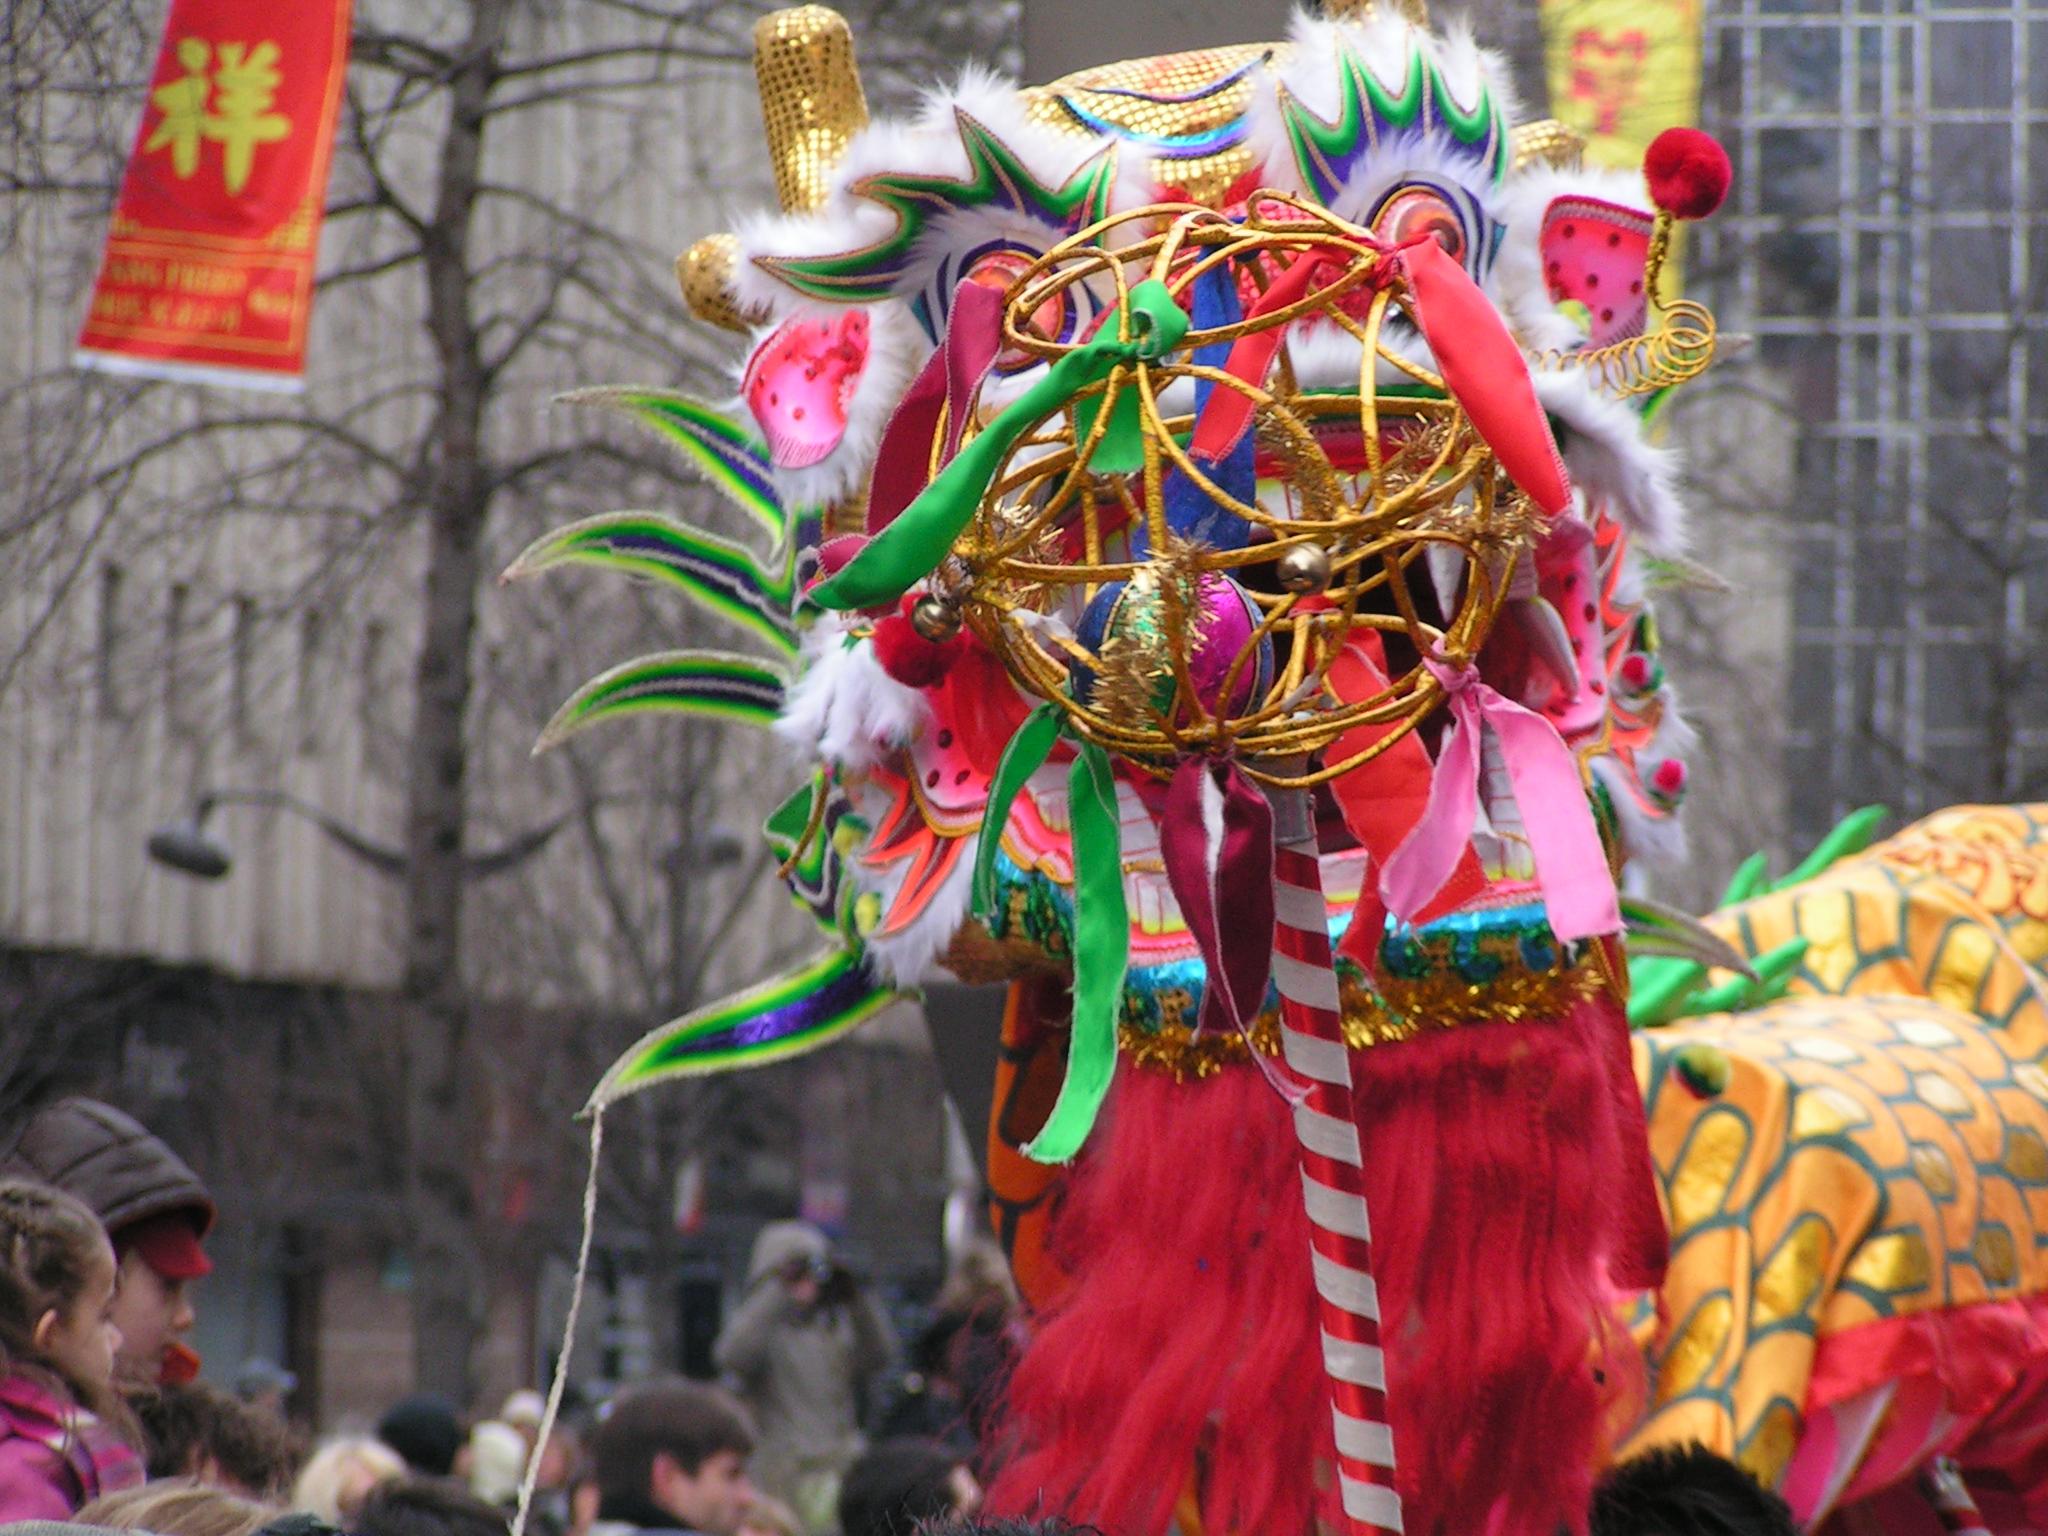 [2009-01-31] Nouvel an chinois, Paris XIII